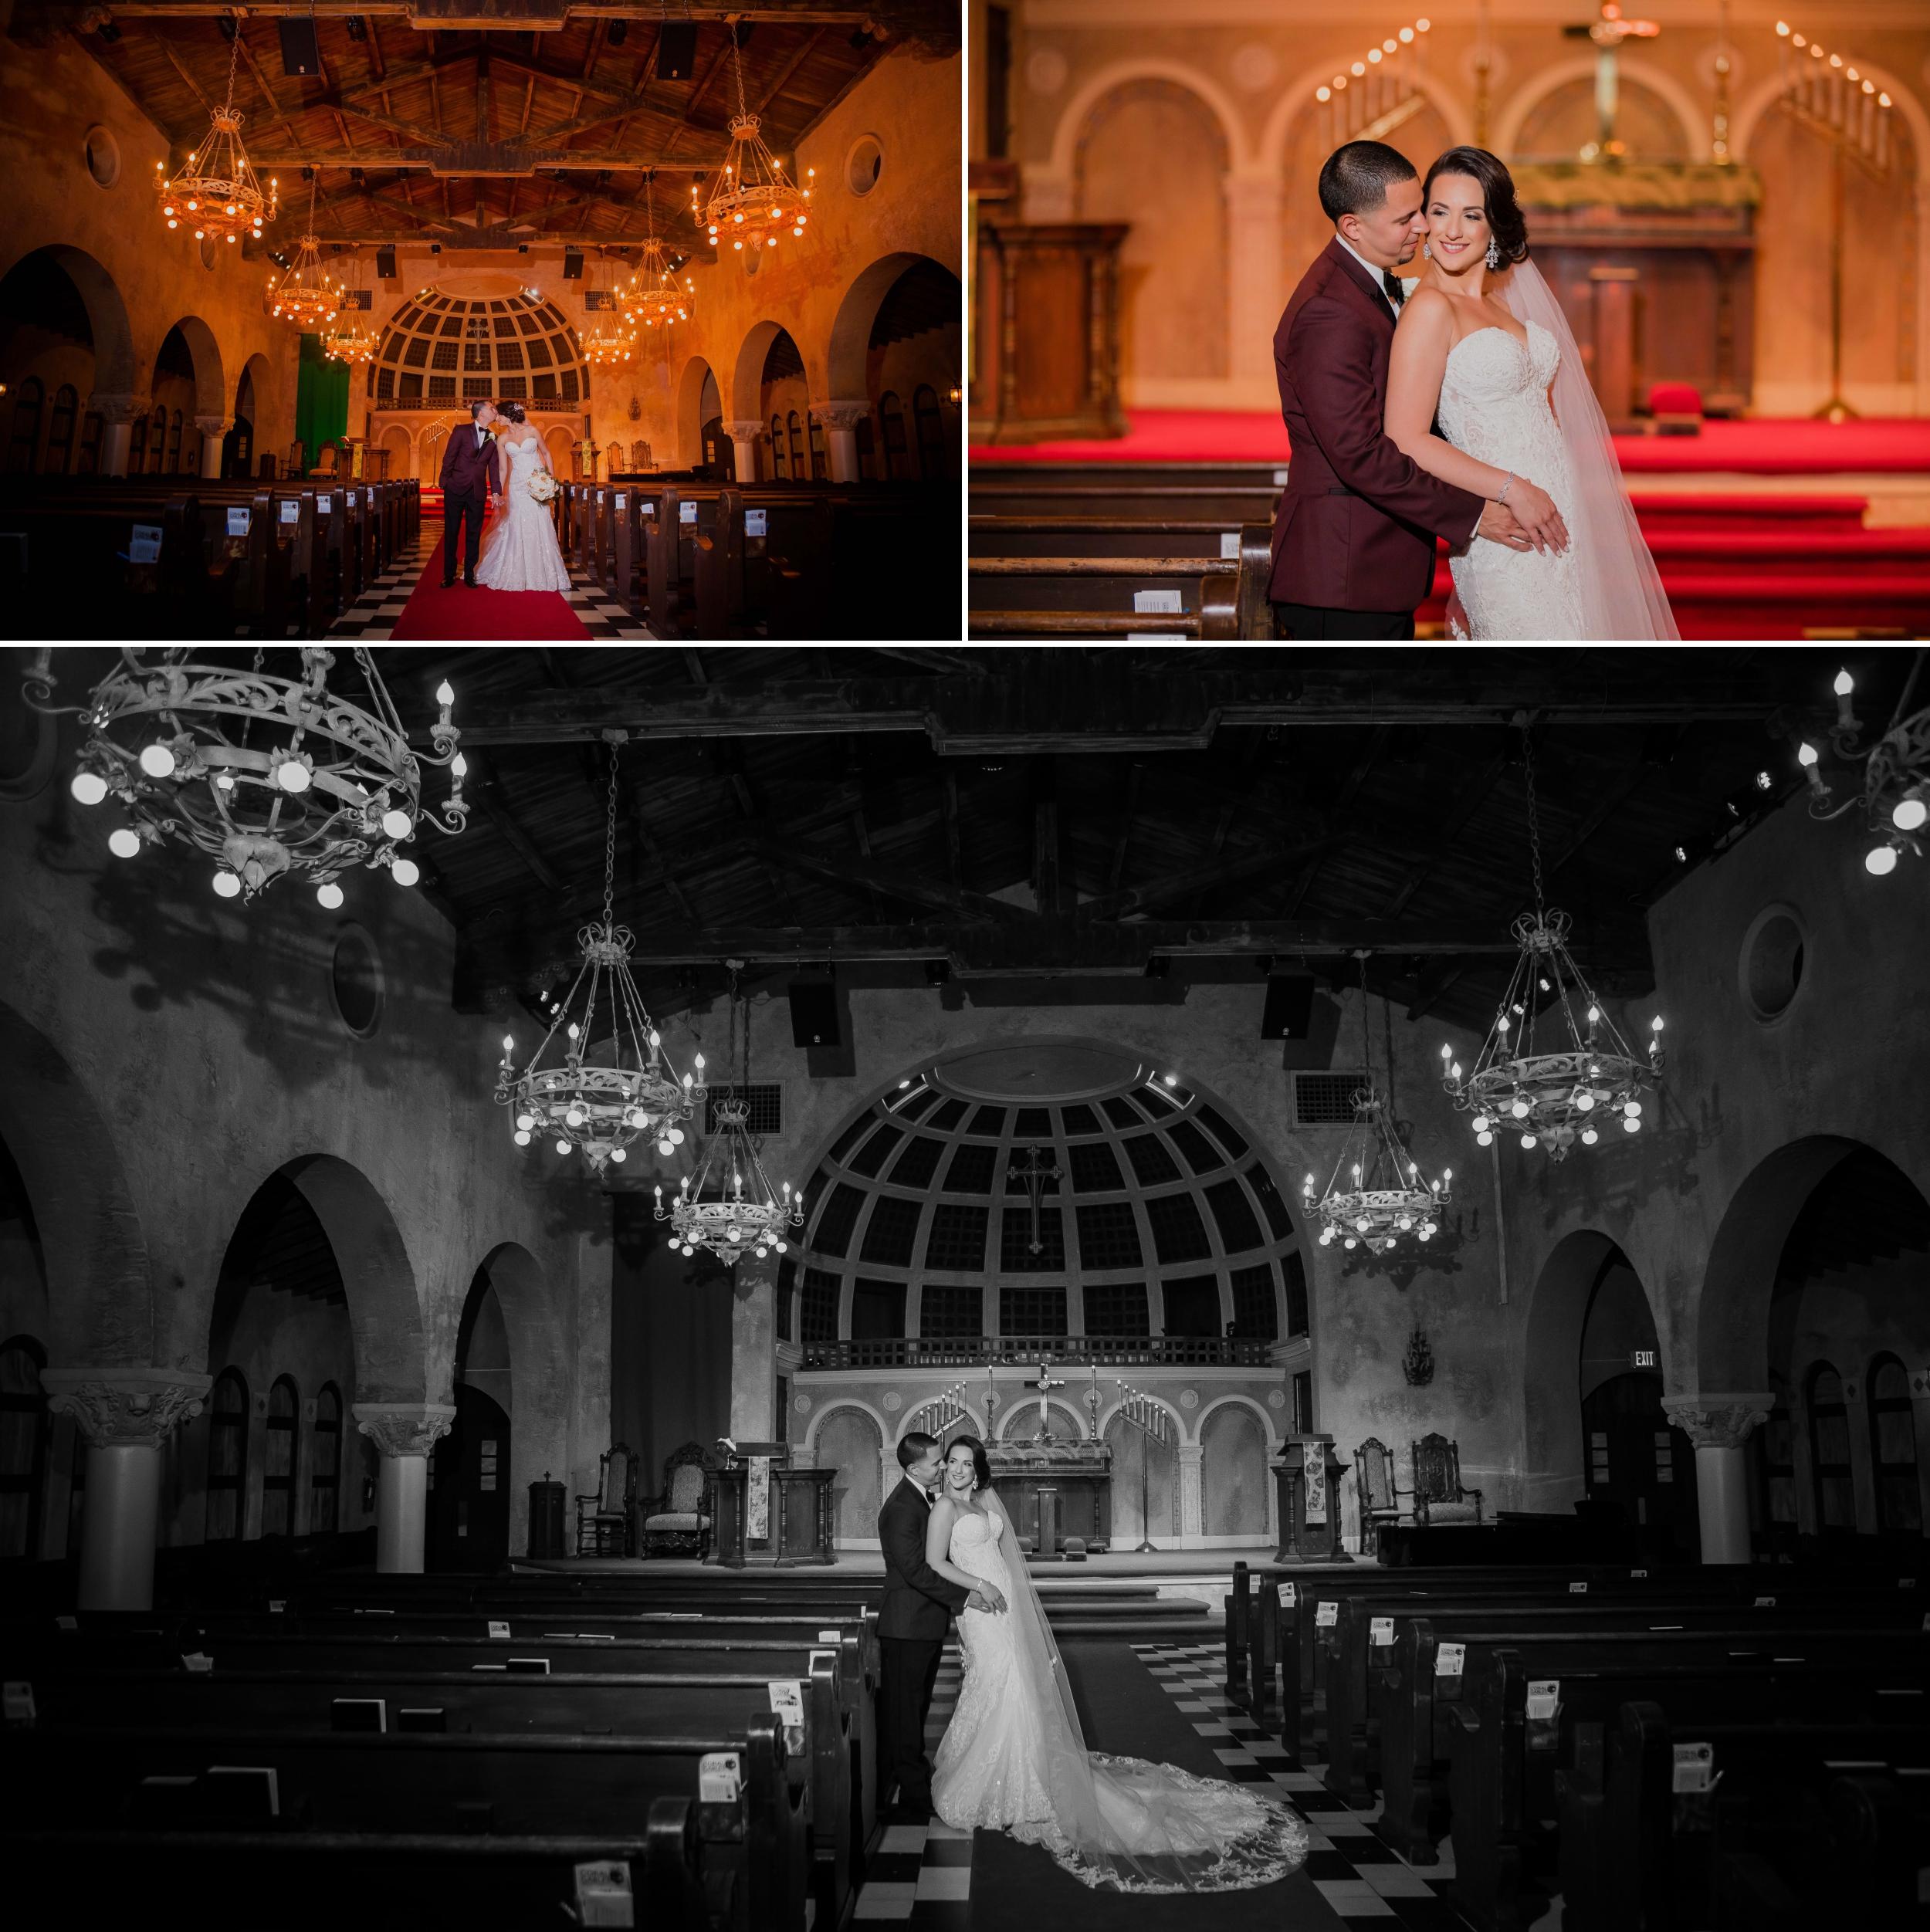 Wedding - Coco Plum - Coral Gables Congregational - Santy Martinez Photography 24.jpg